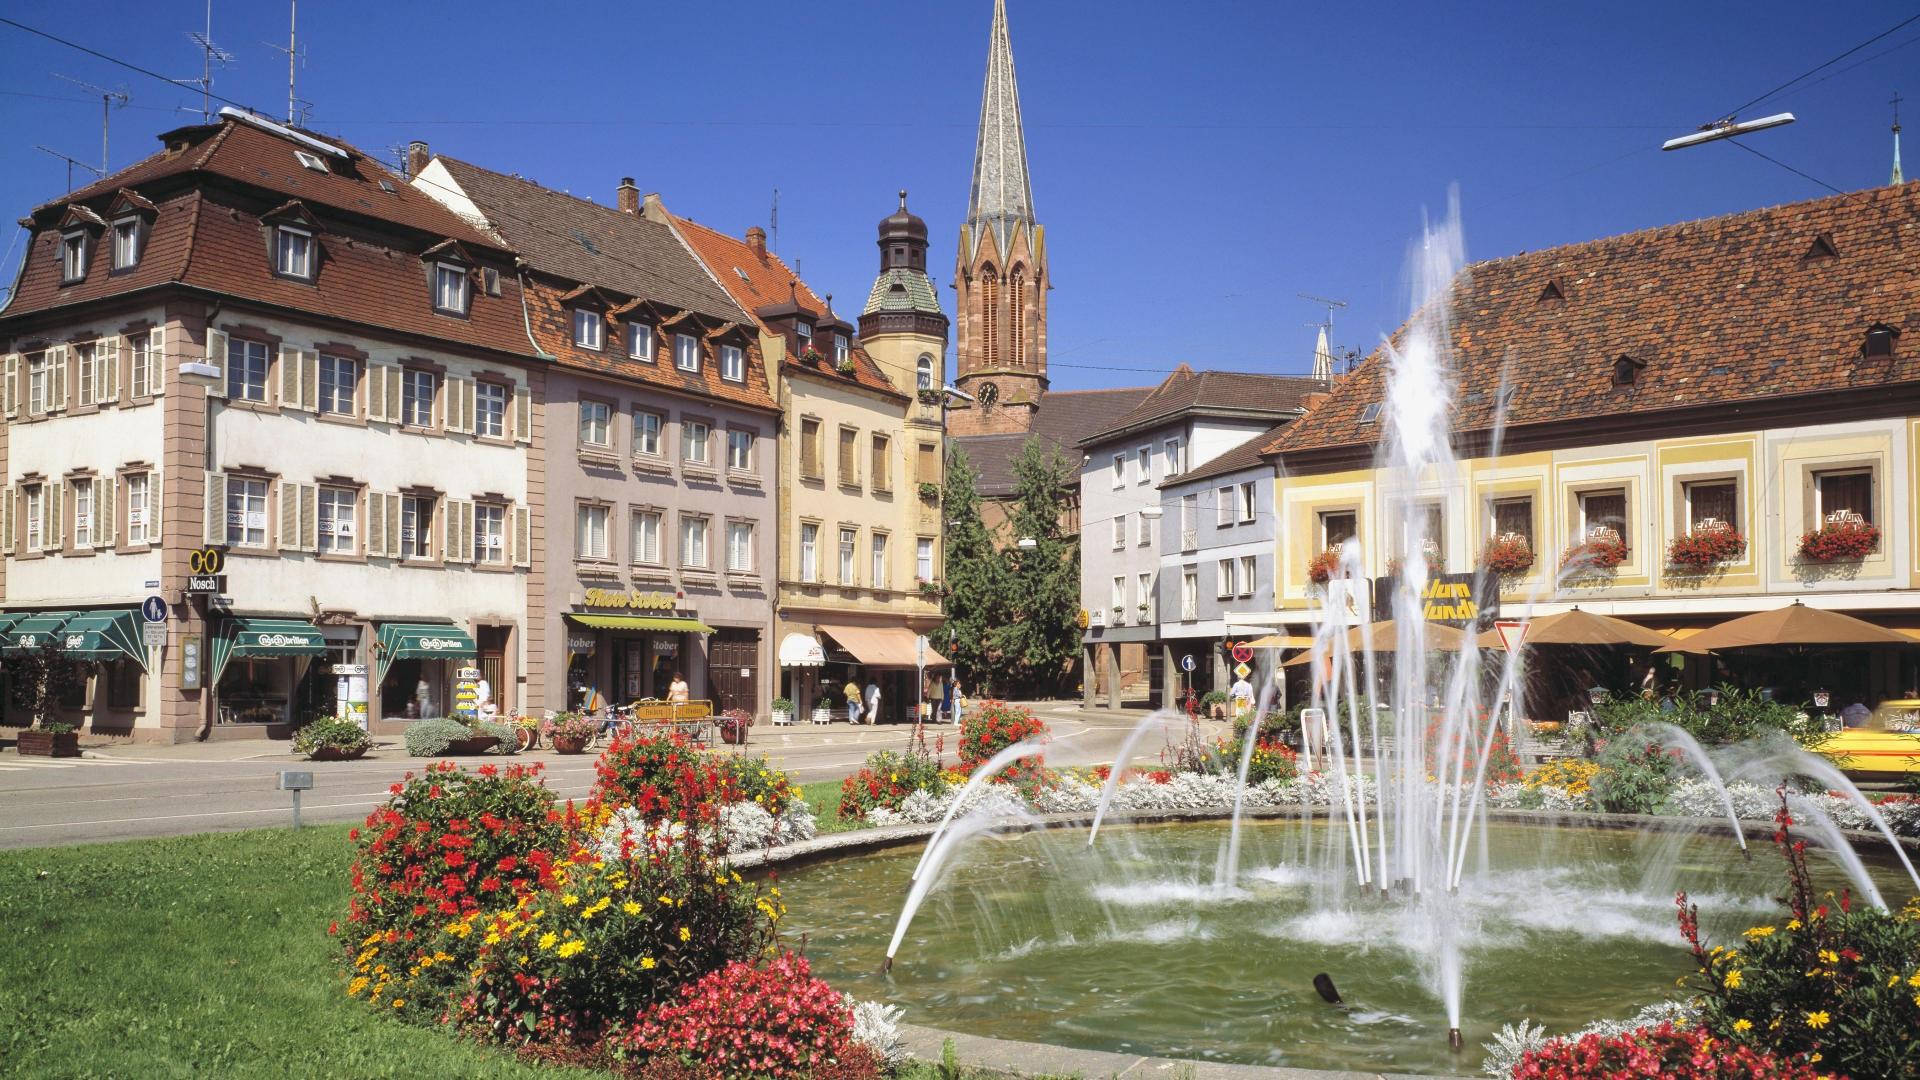 Lorch Village, Hesse, Rhine River, Germany  № 78321  скачать